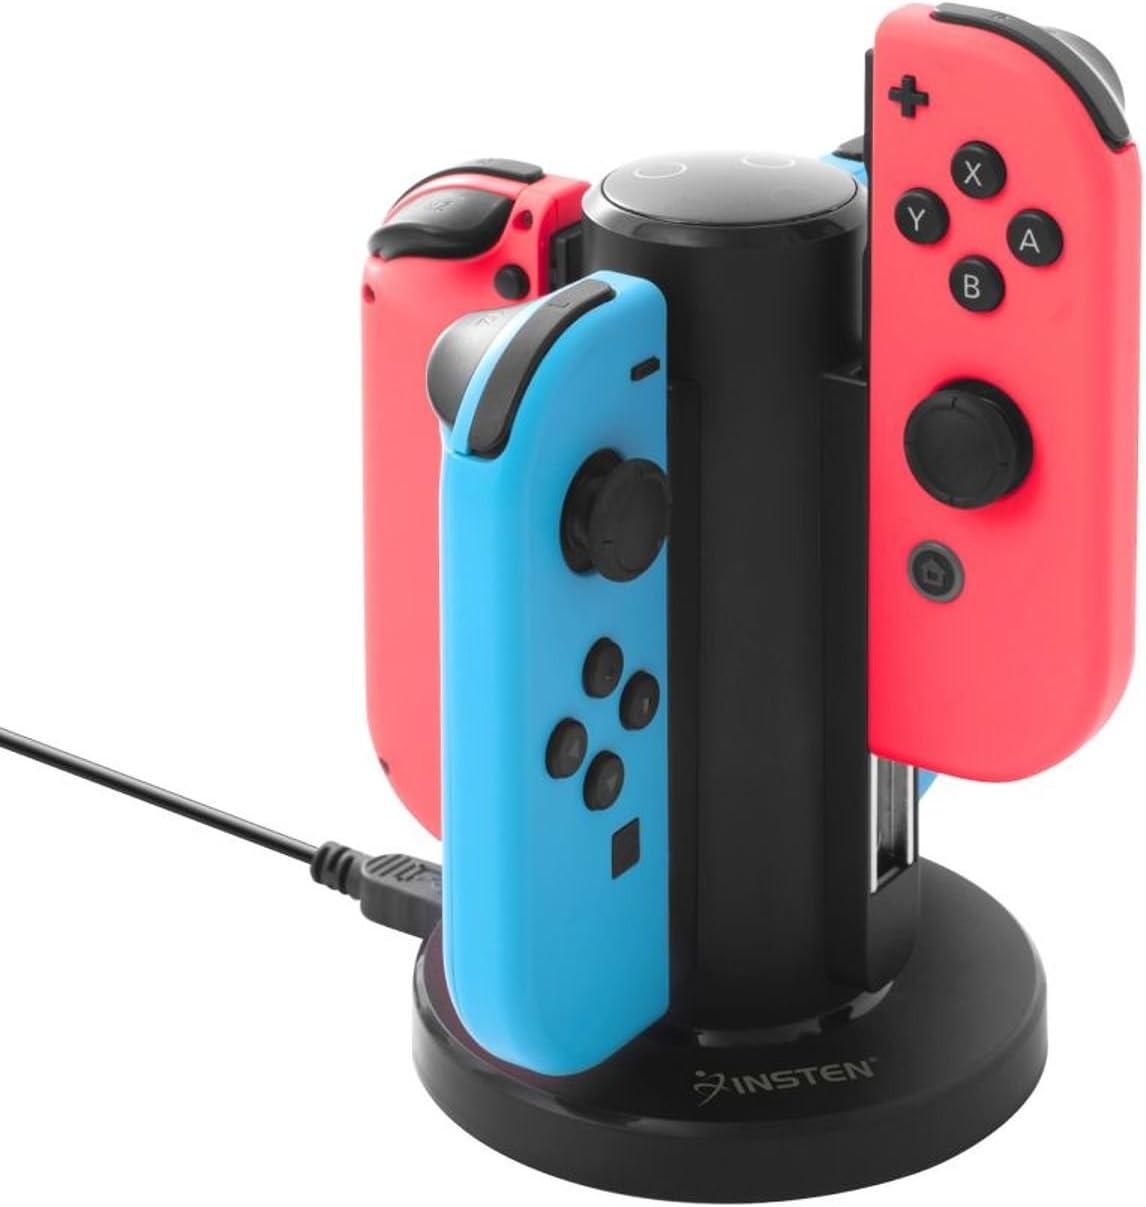 Amazon.com: Insten Joy-Con USB Charging Dock for Nintendo Switch ...